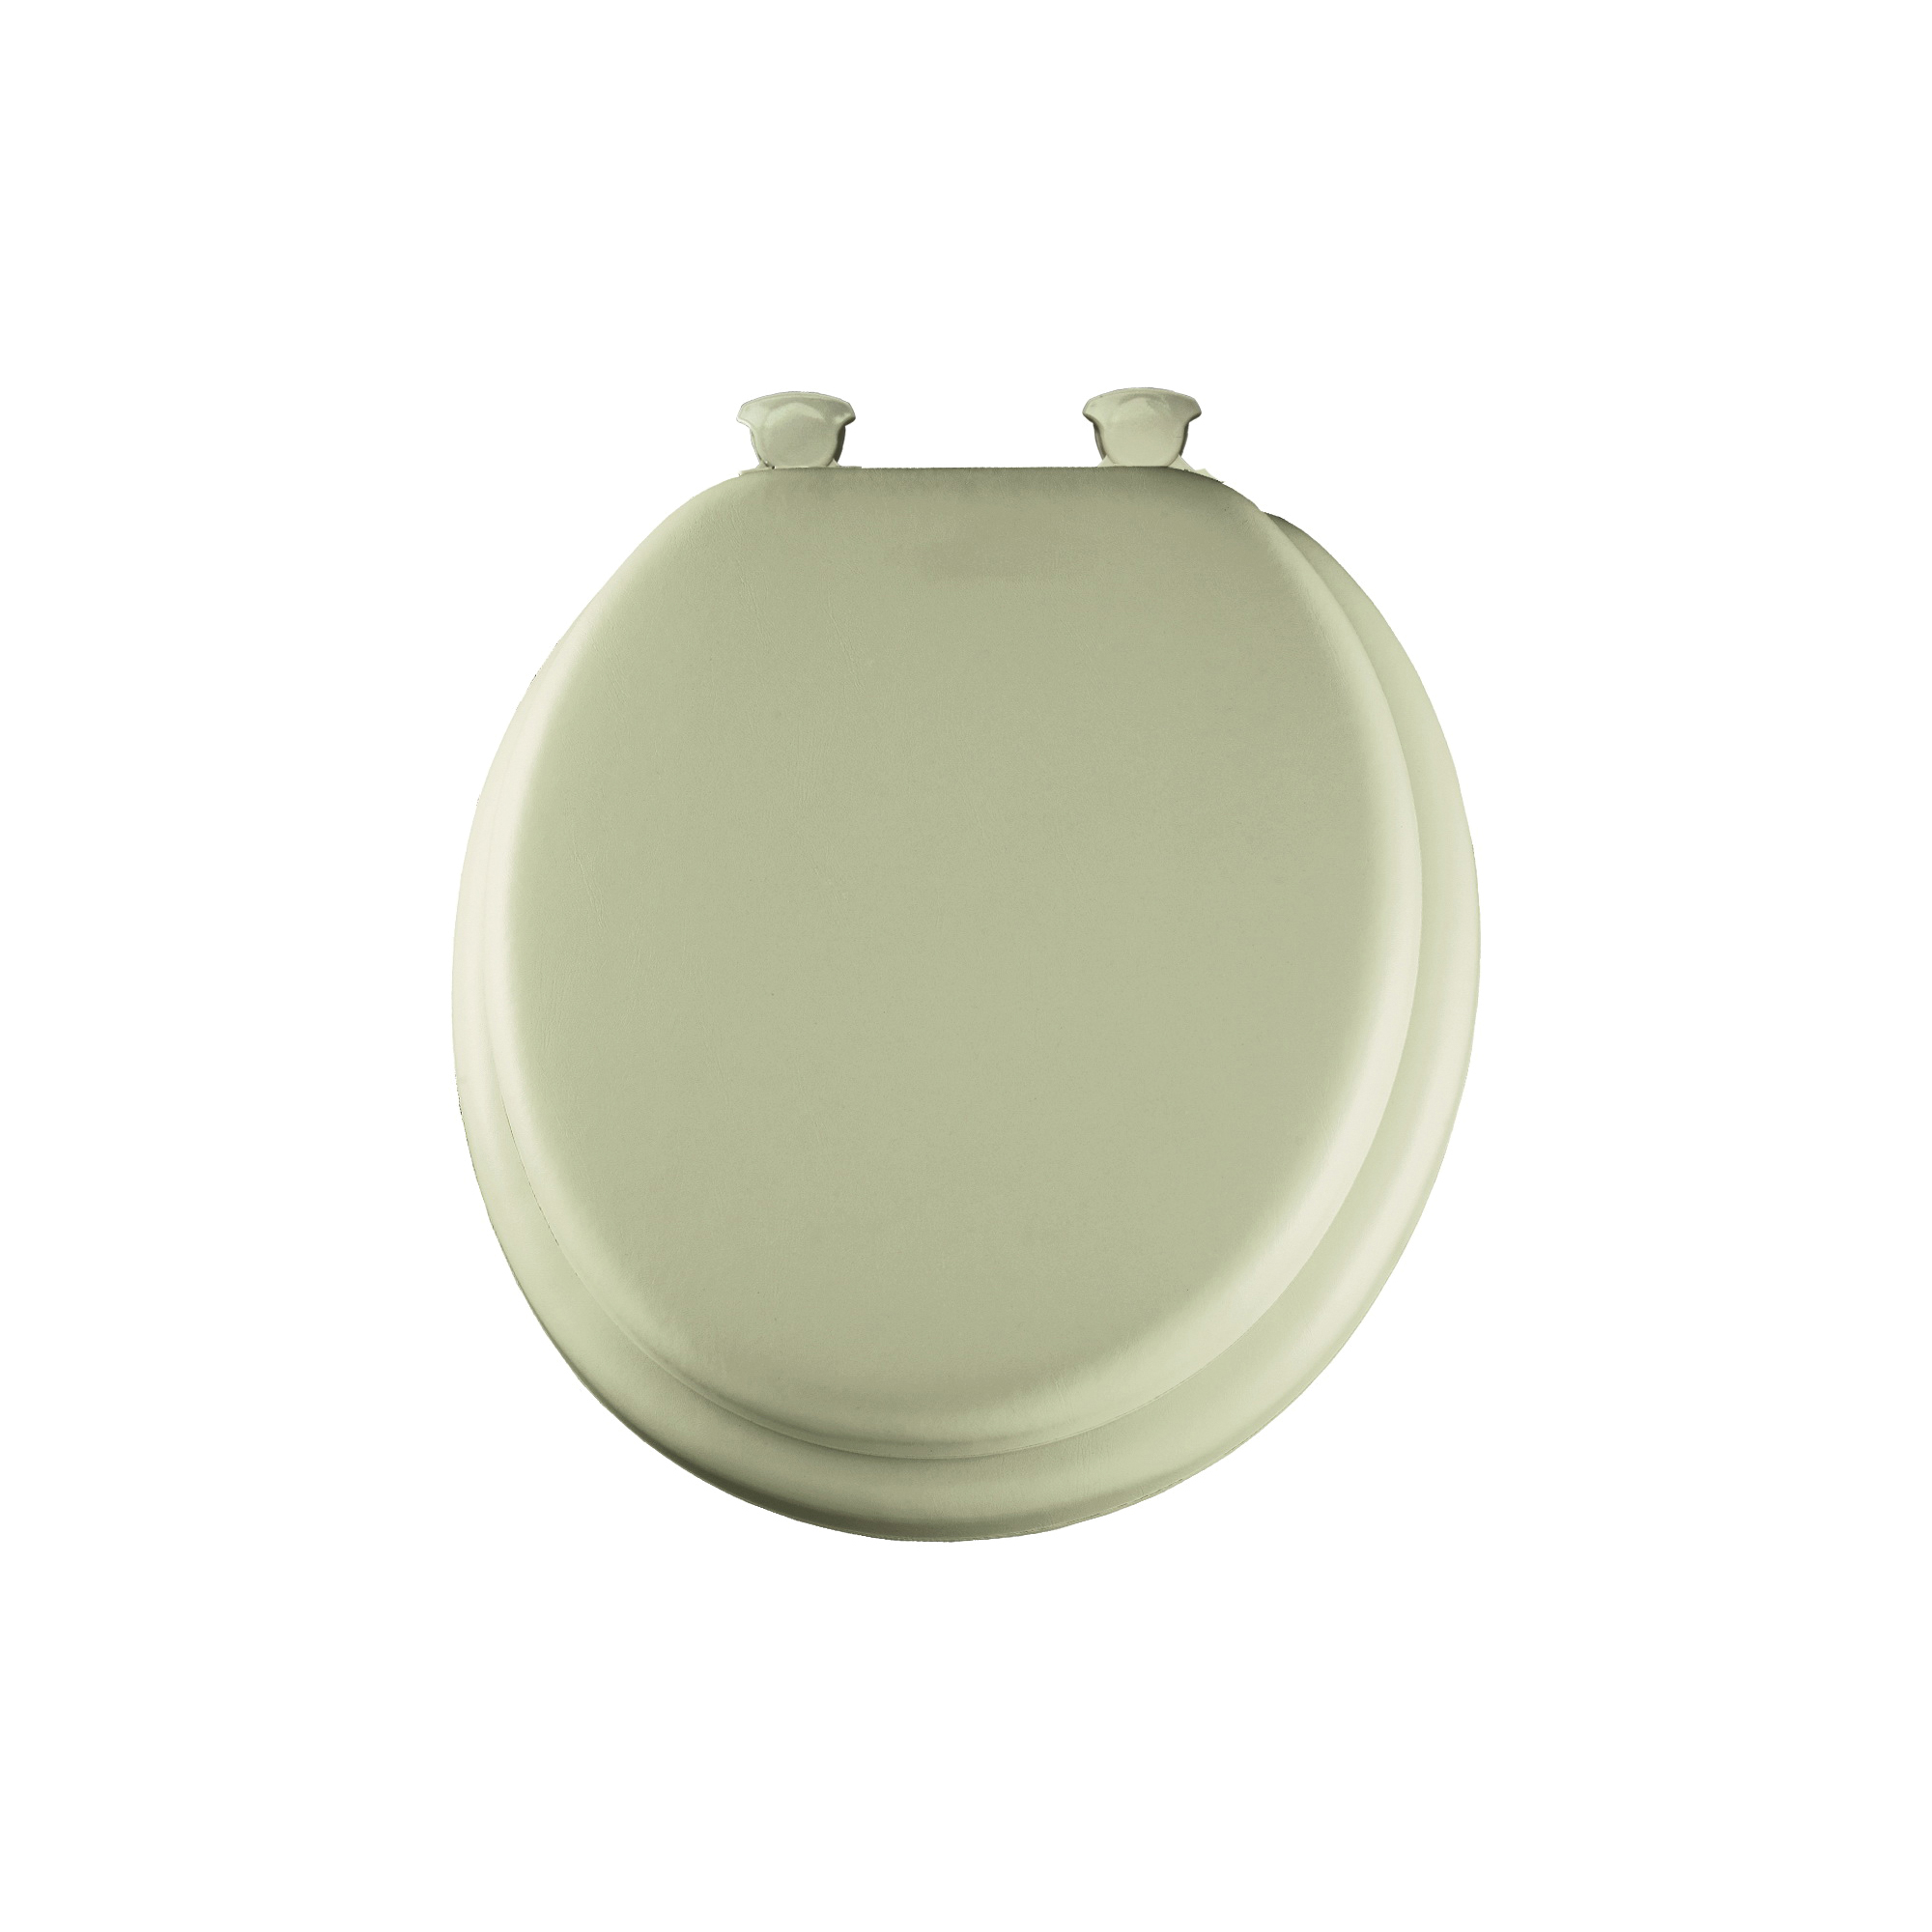 Mayfair® 13EC 006 Toilet Seat, Round Bowl, Closed Front, Plastic, Bone, Easy Clean/Change® Hinge